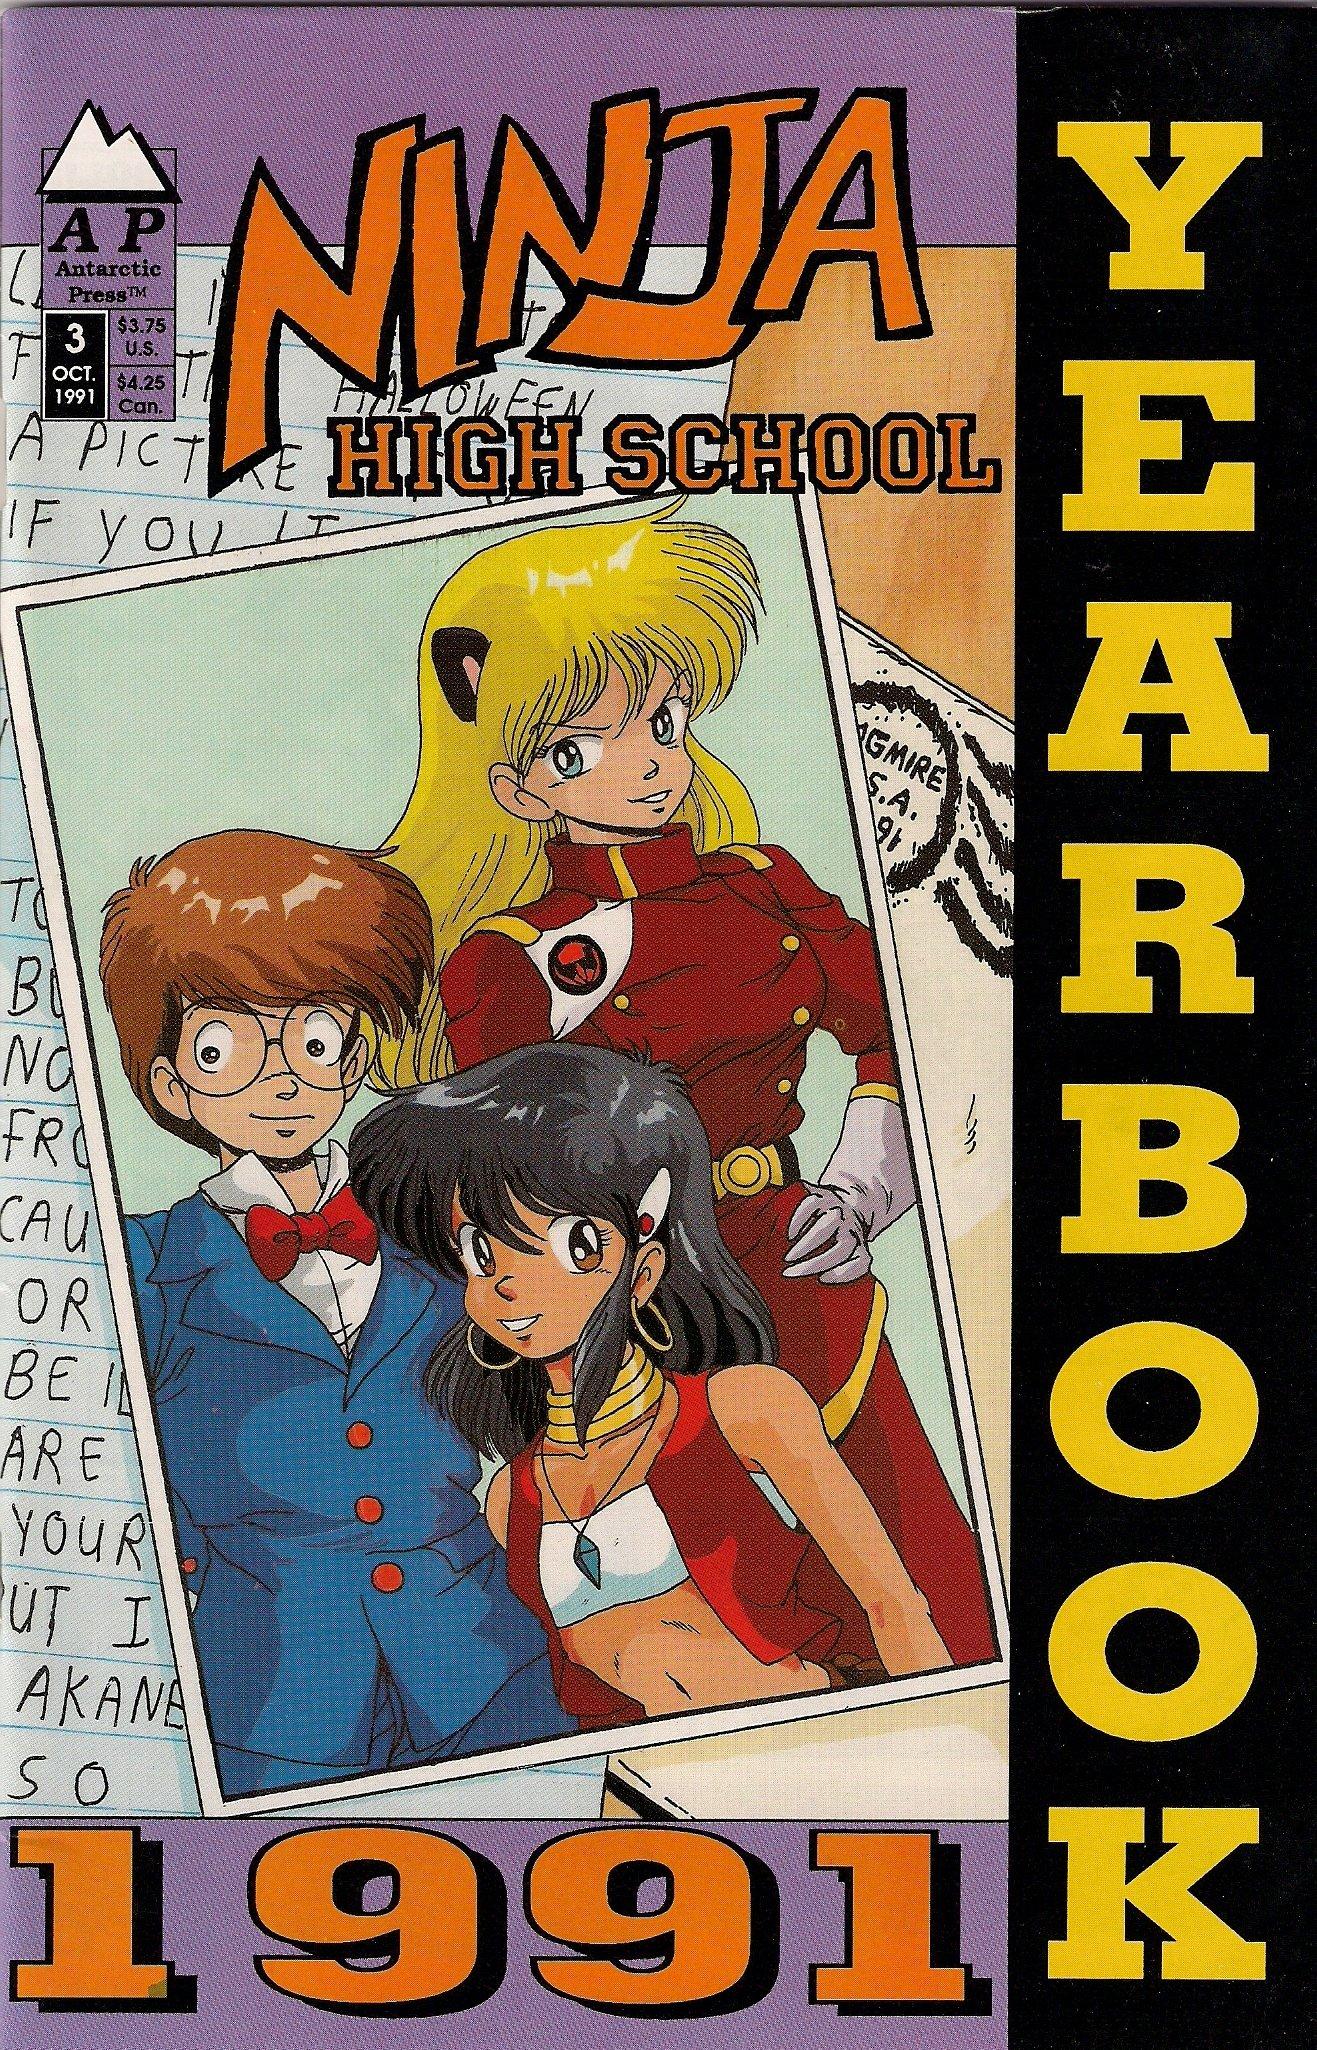 NINJA HIGH SCHOOL NO. 3 YEARBOOK MANGA ANTARCTIC PRESS ...